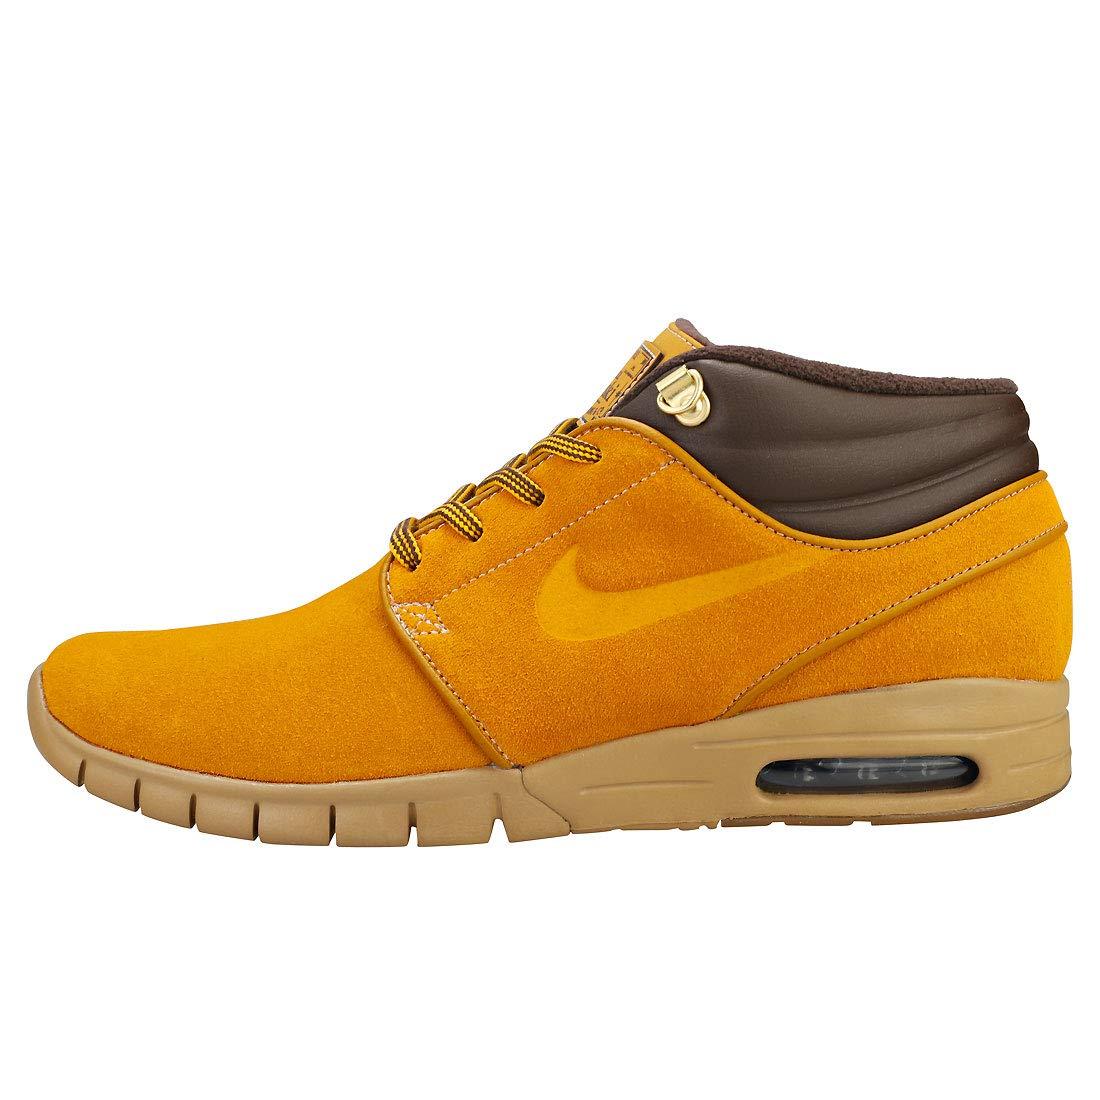 big sale d6ce6 dbfda Amazon.com | Nike Stefan Janoski MAX MID PRM Mens Skateboarding-Shoes  AV3610 | Shoes